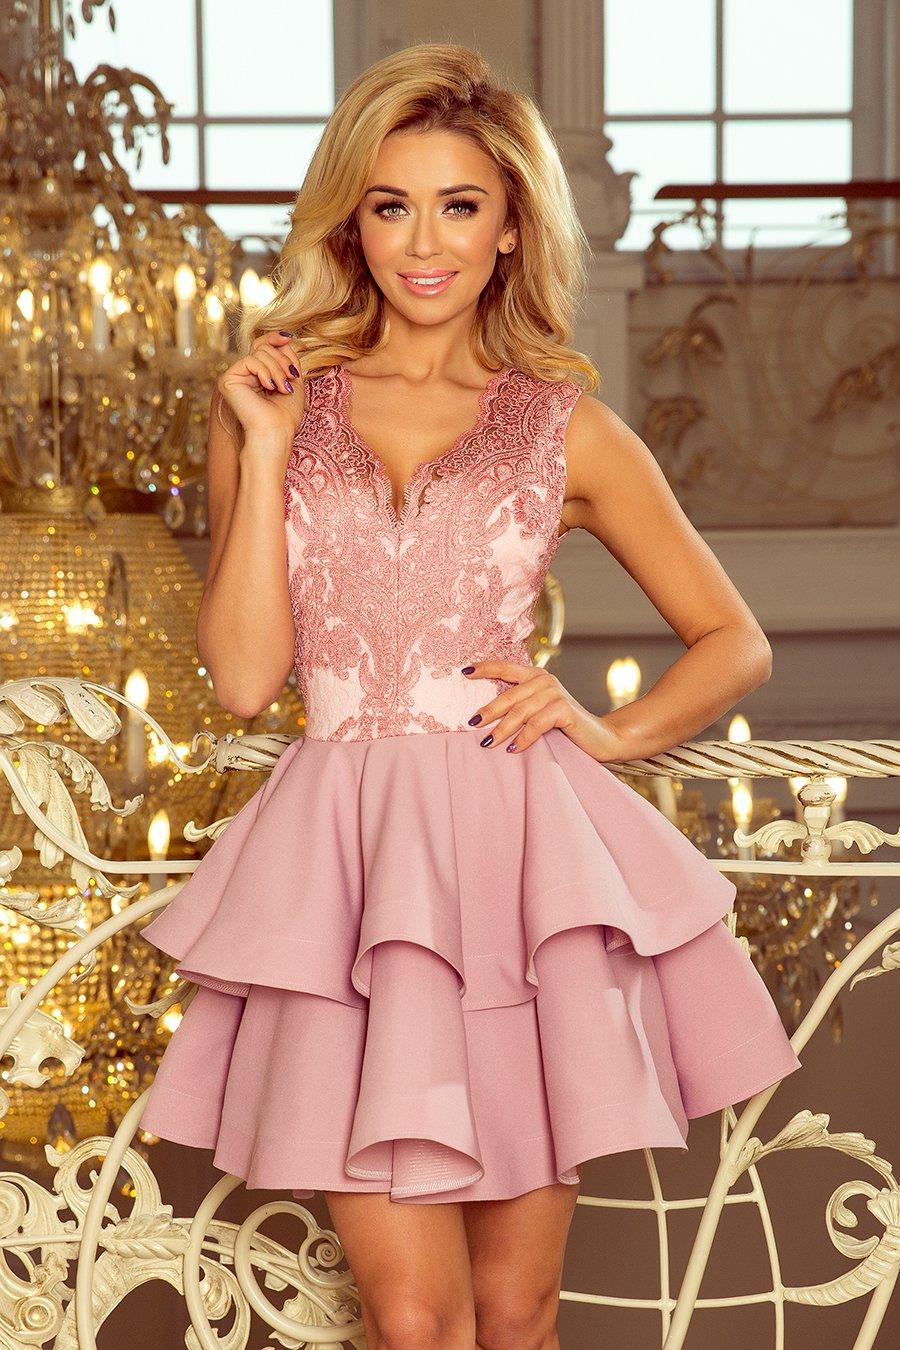 3b61c1583b 200-5 CHARLOTTE sukienka na wesele różowa L 40 - 7341951721 ...